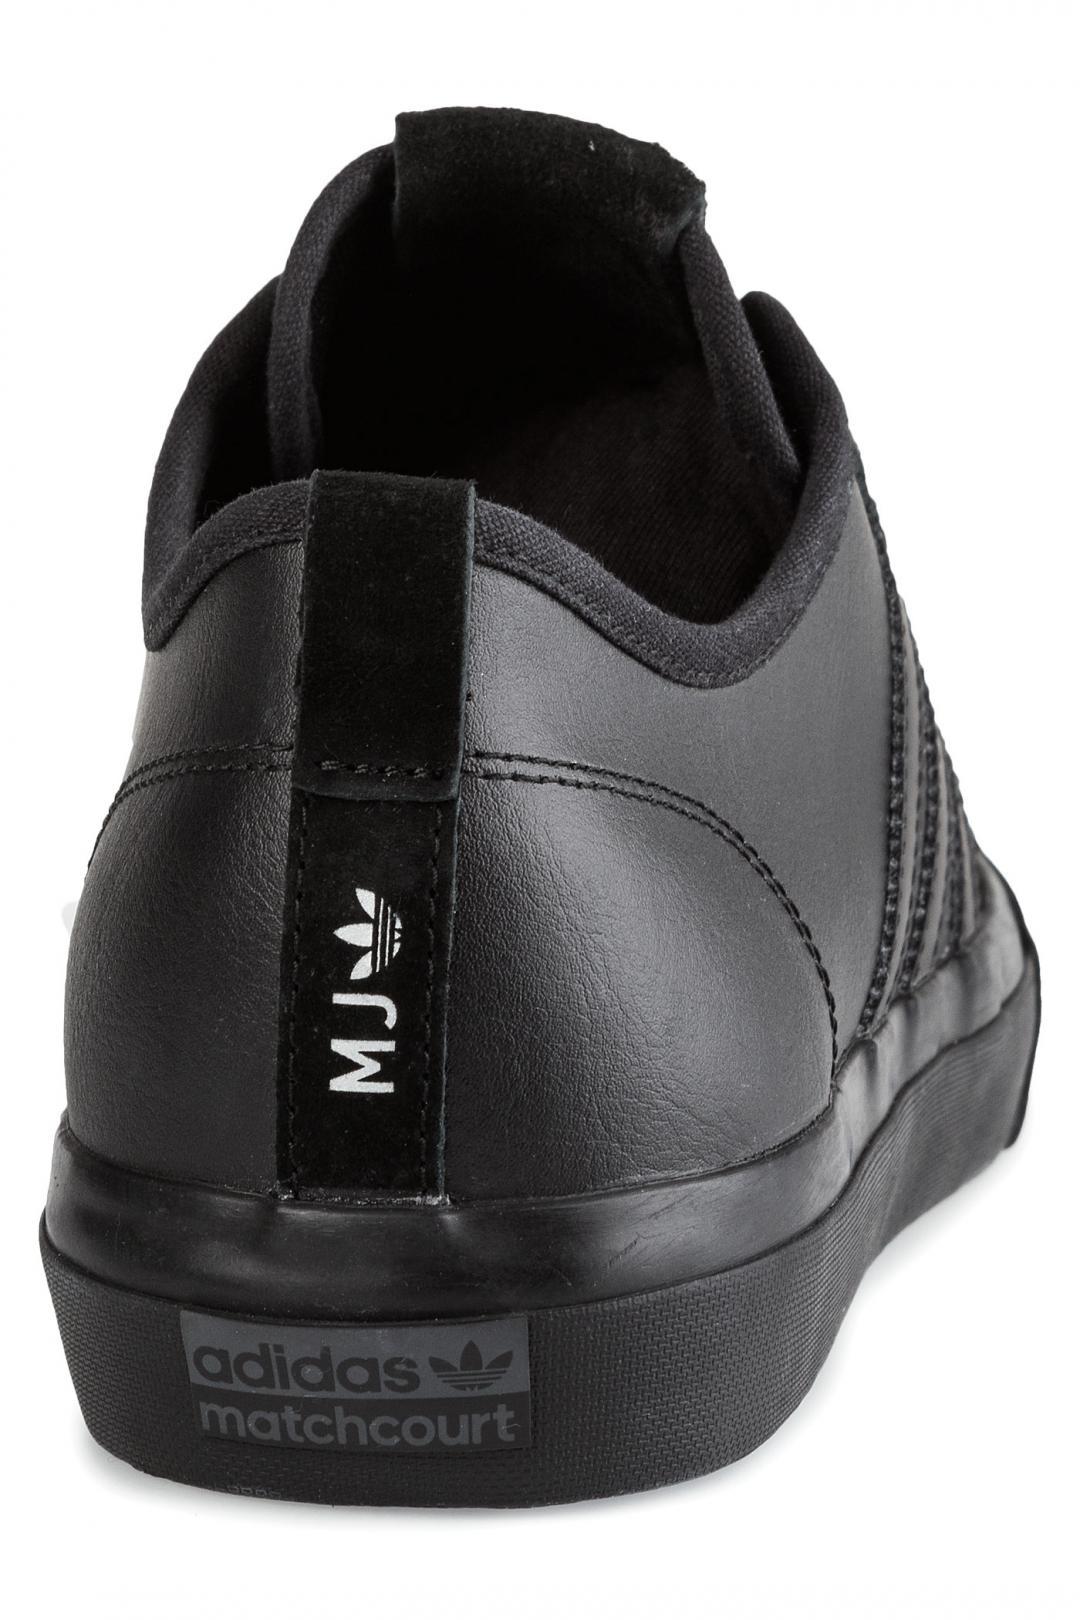 Uomo adidas Skateboarding Matchcourt RX core black core black silver | Scarpe da skate